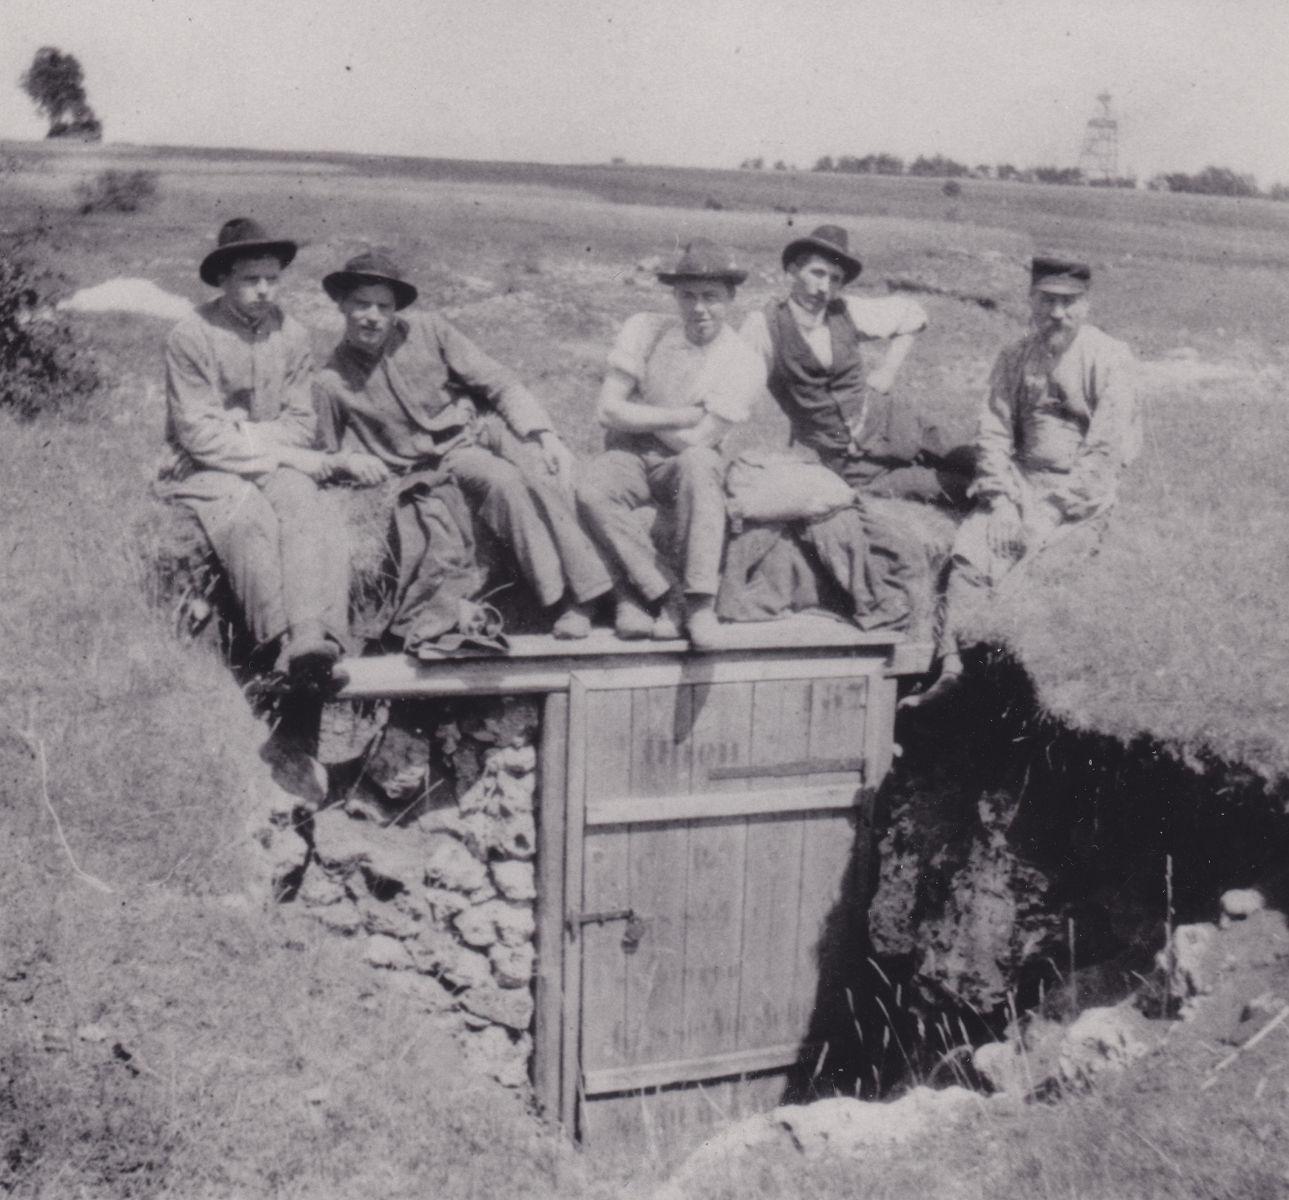 Der Höhleneigang um 1900